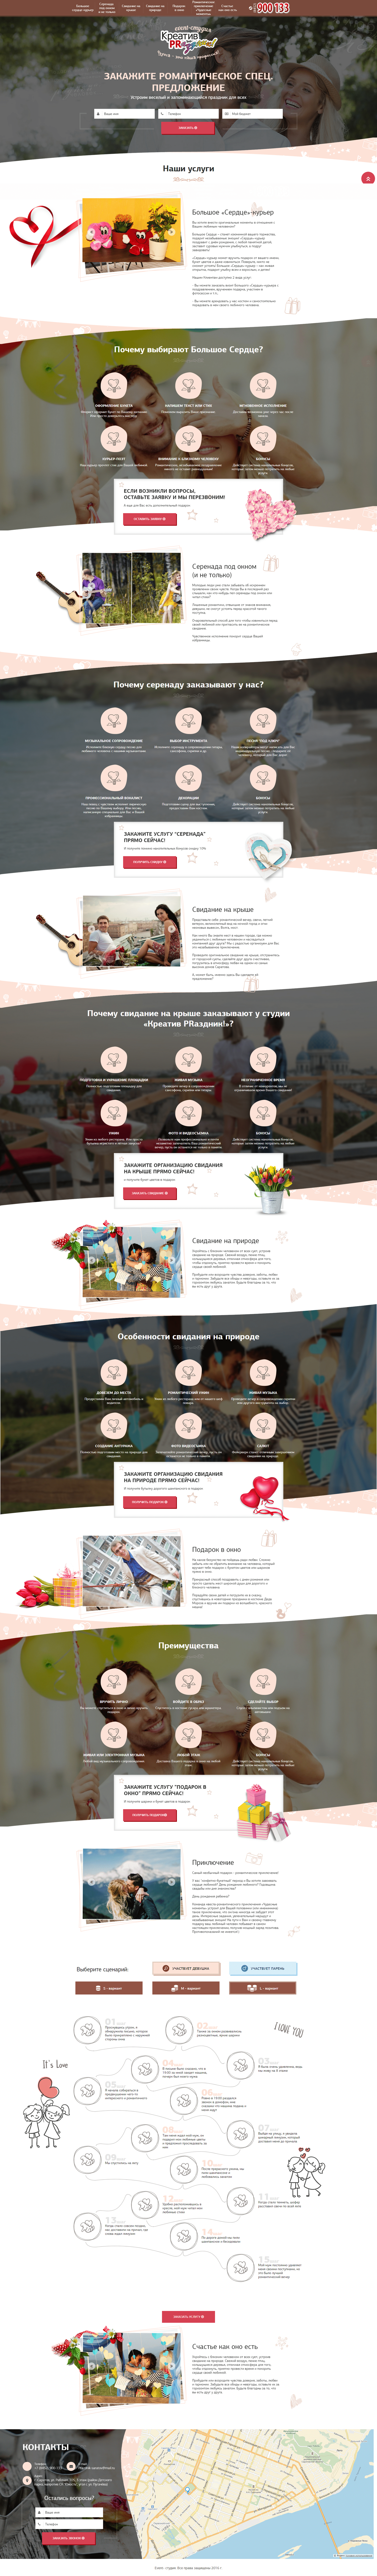 Дизайн Landing Page для креативного агенства